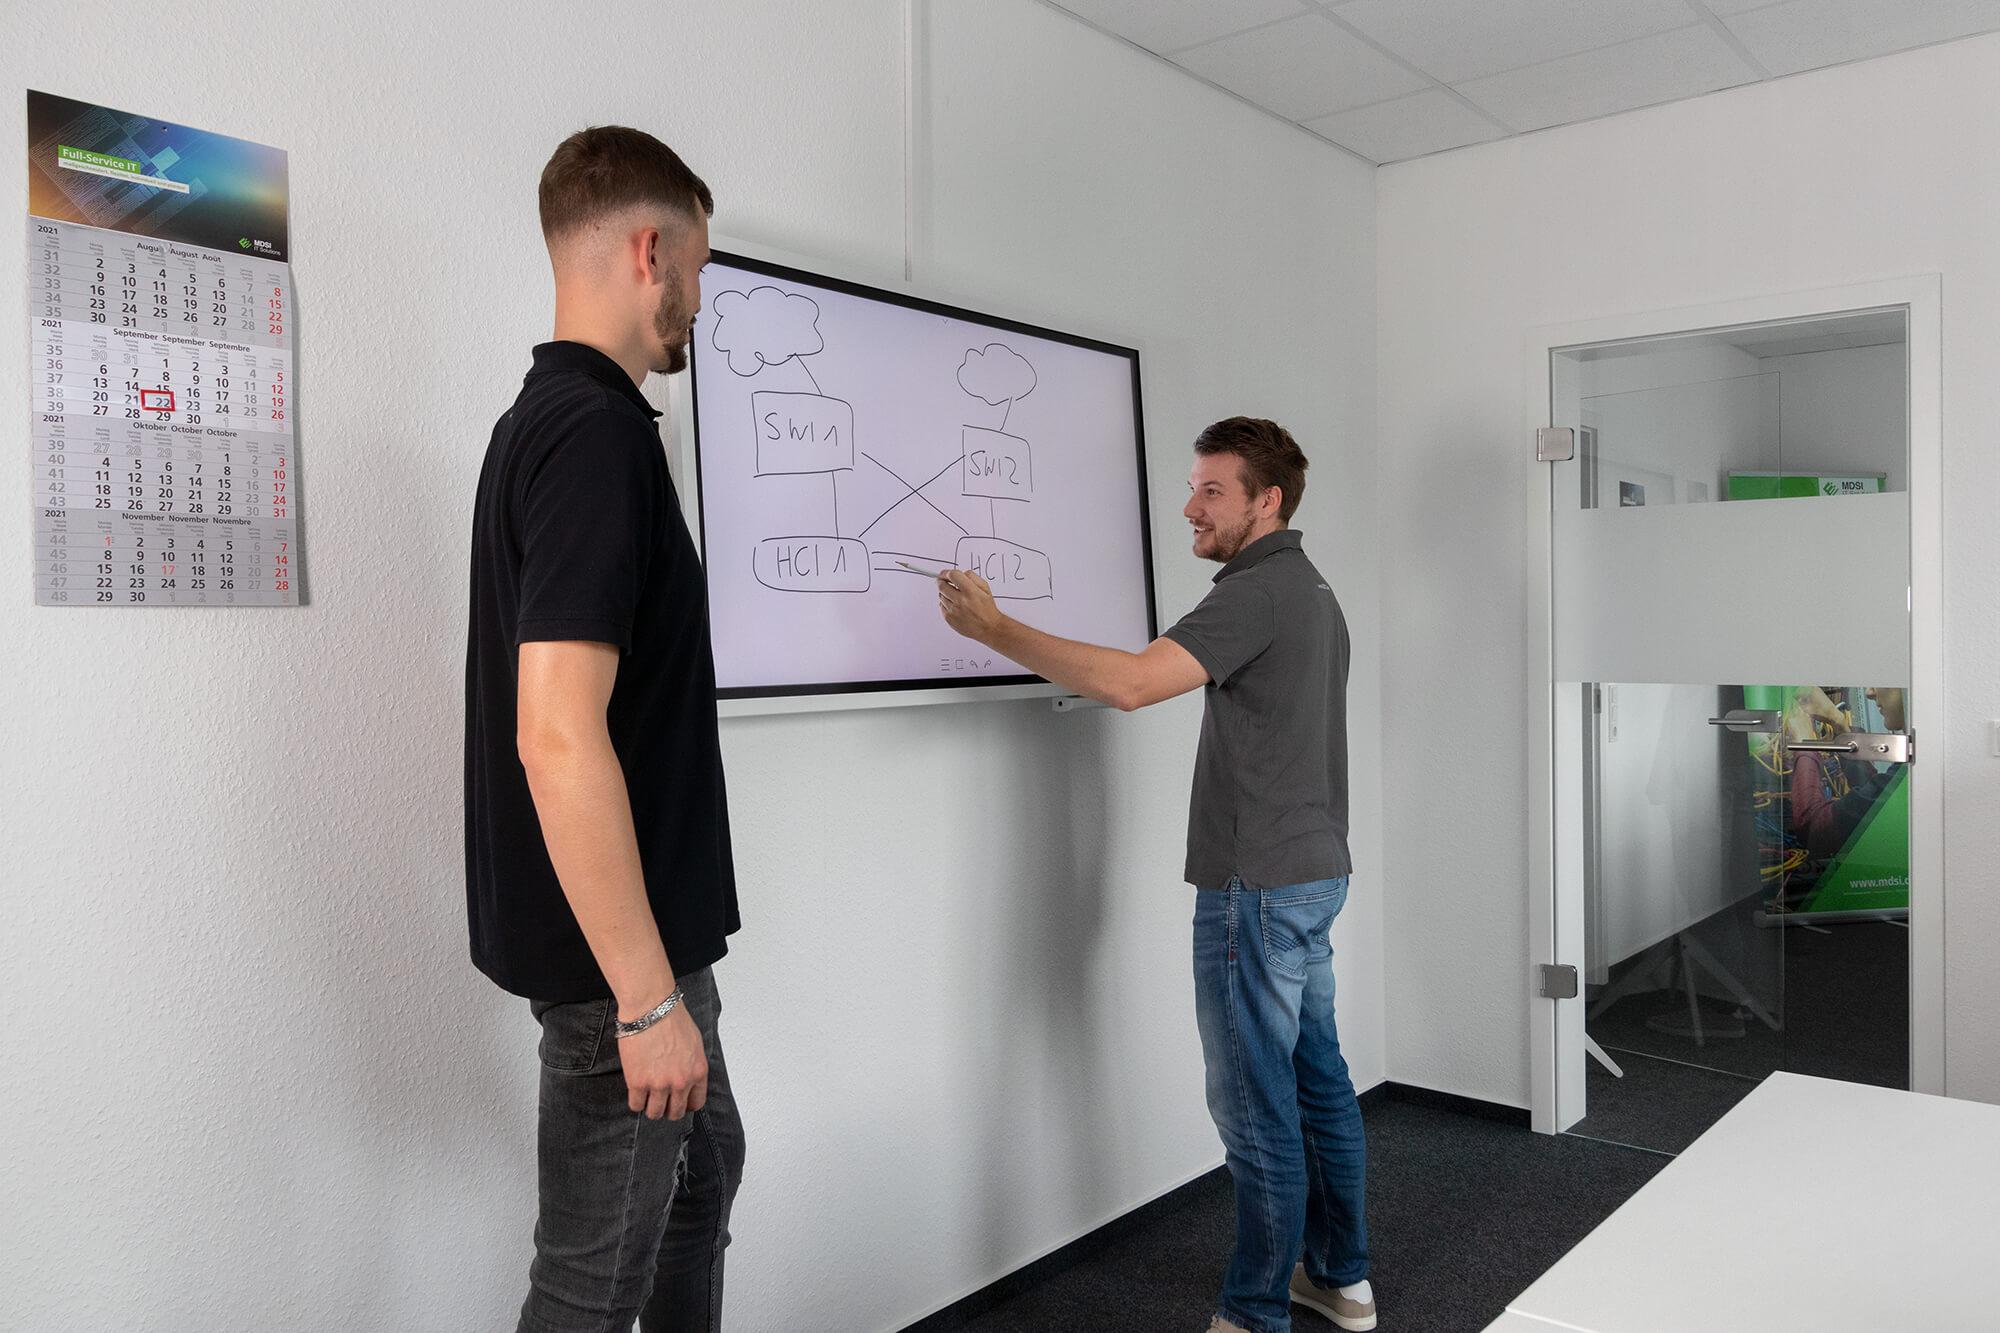 besprechung.jpg – MDSI IT Solutions GmbH